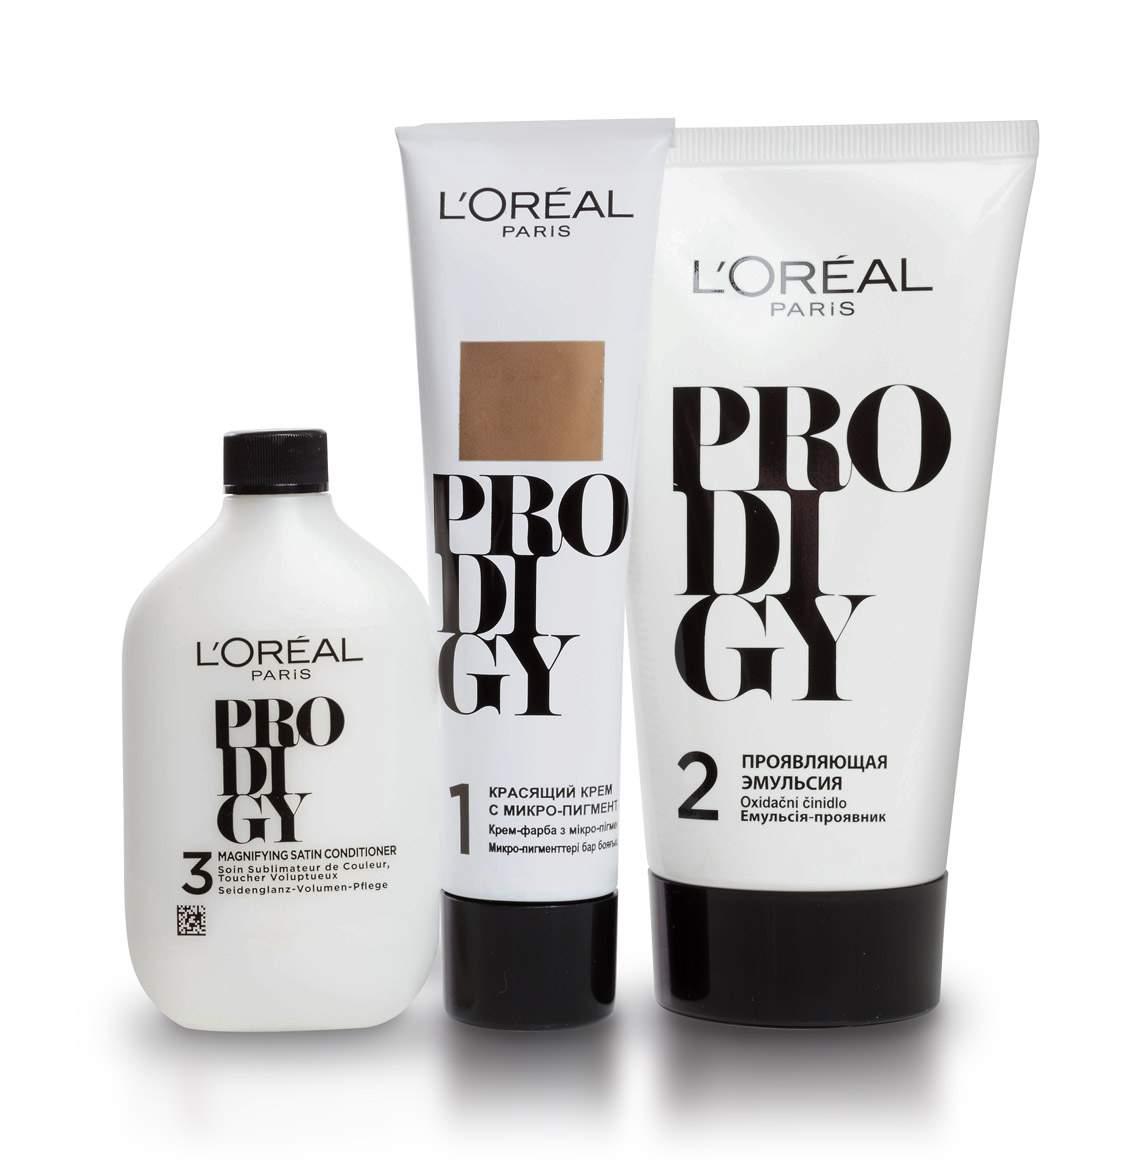 Миниатюра Краска для волос L`Oreal Paris Prodigy тон 7.0 миндаль №2